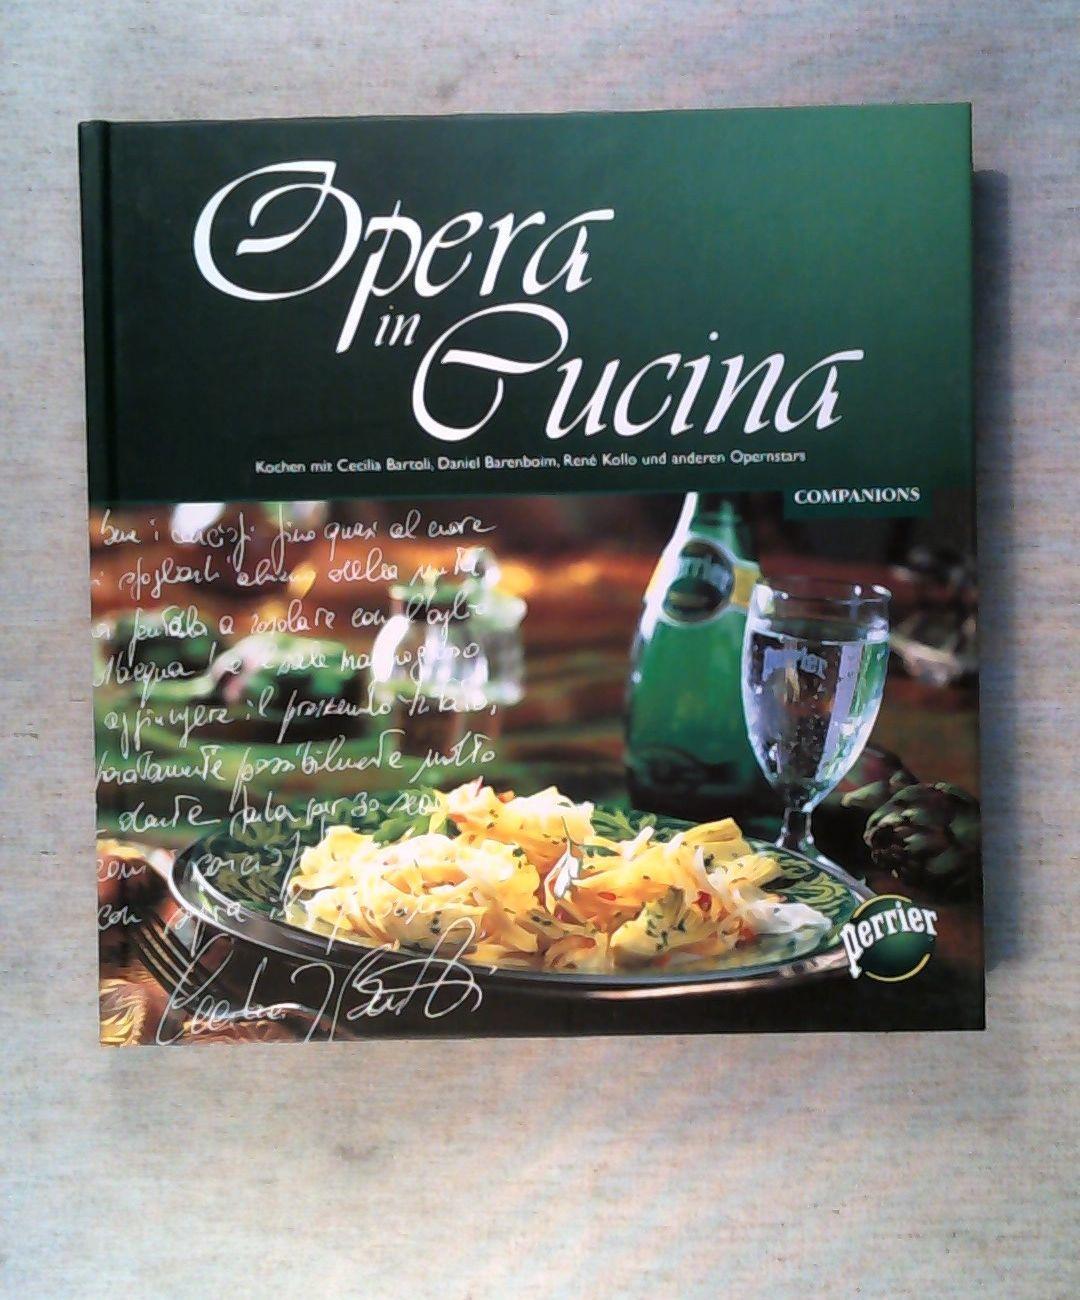 Opera in Cucina Kochen mit Placido Domingo, José Carreras und anderen Opernstars - Rüffer, Theodor